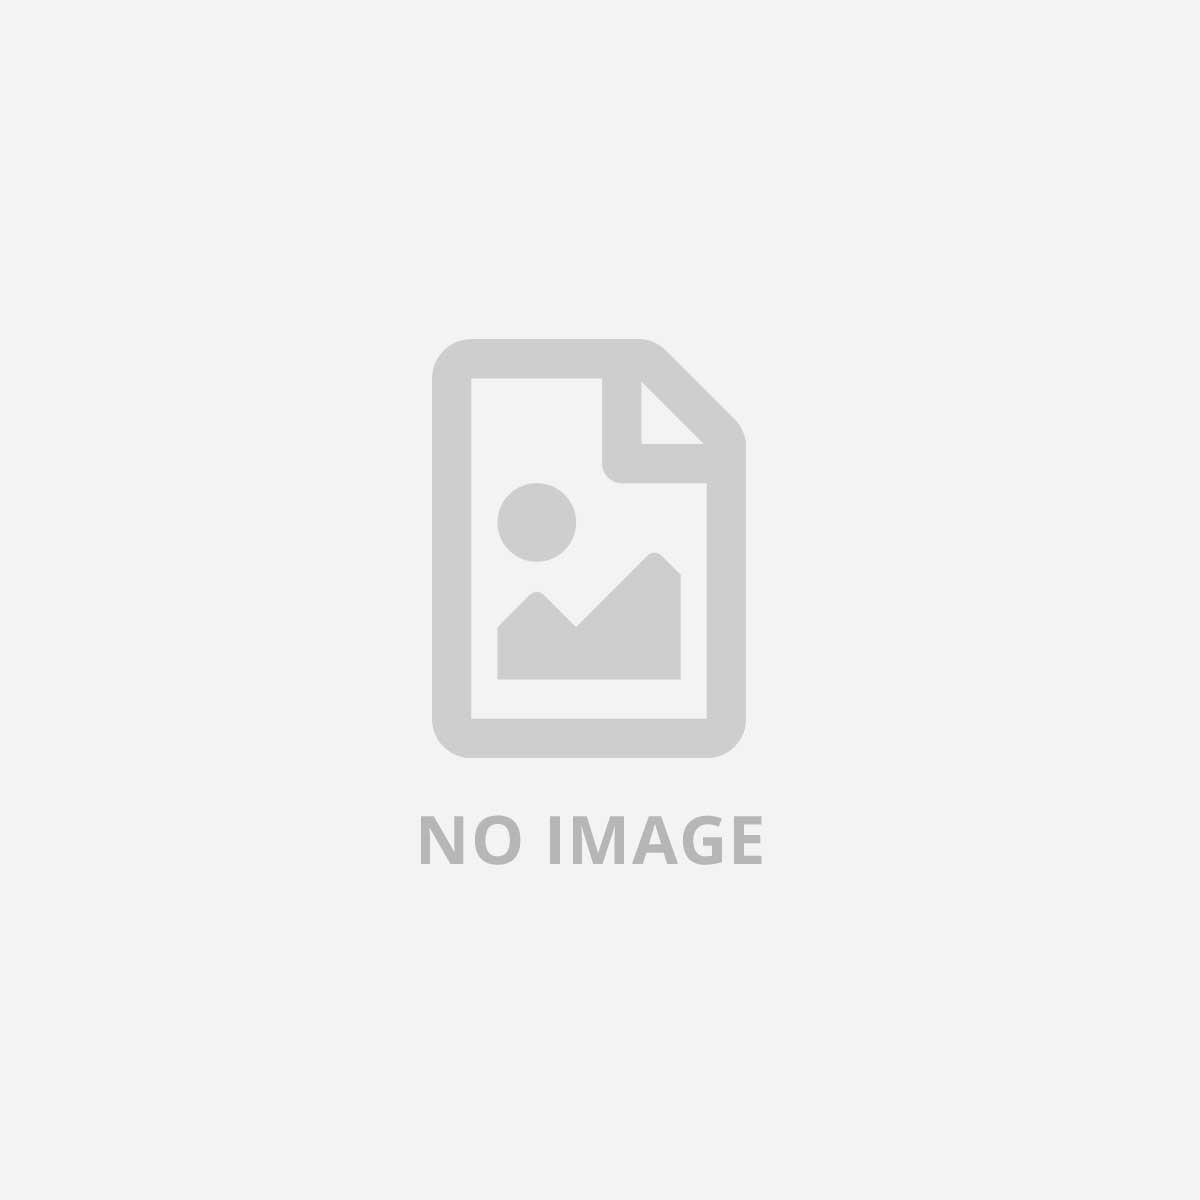 AVERY SISTEMA DI ETICHET.X CD/DVD BLISTER